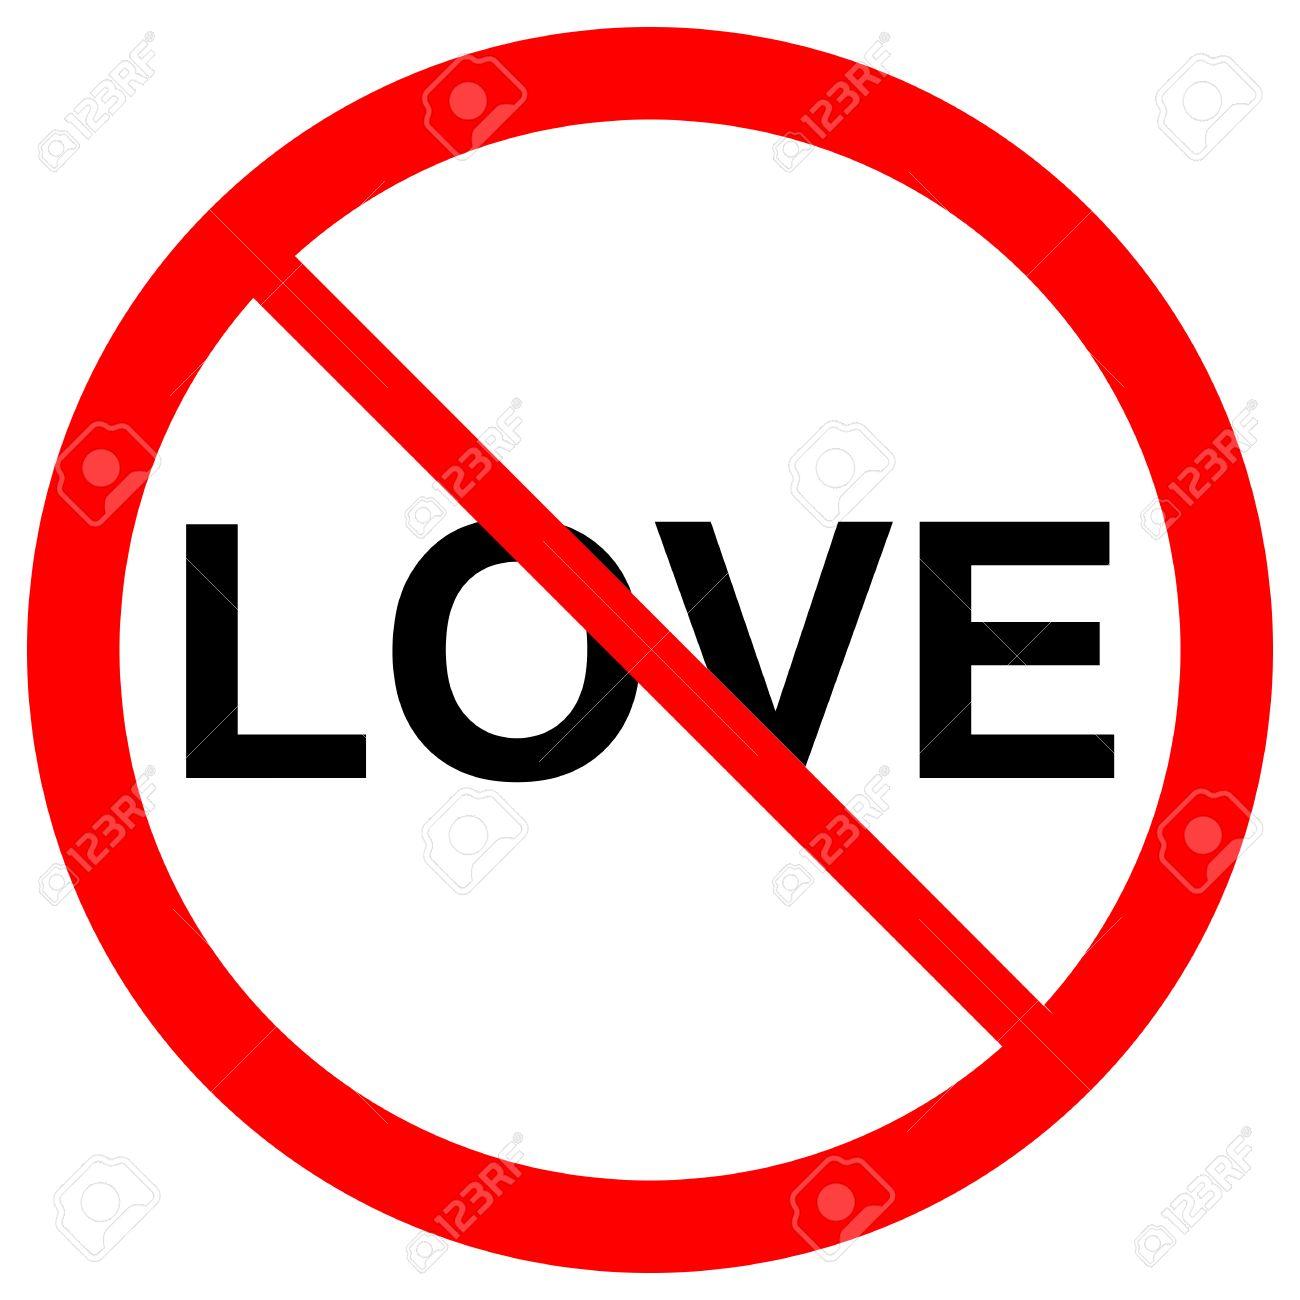 No love forbidden sign symbol on white background stock photo no love forbidden sign symbol on white background stock photo 45139997 buycottarizona